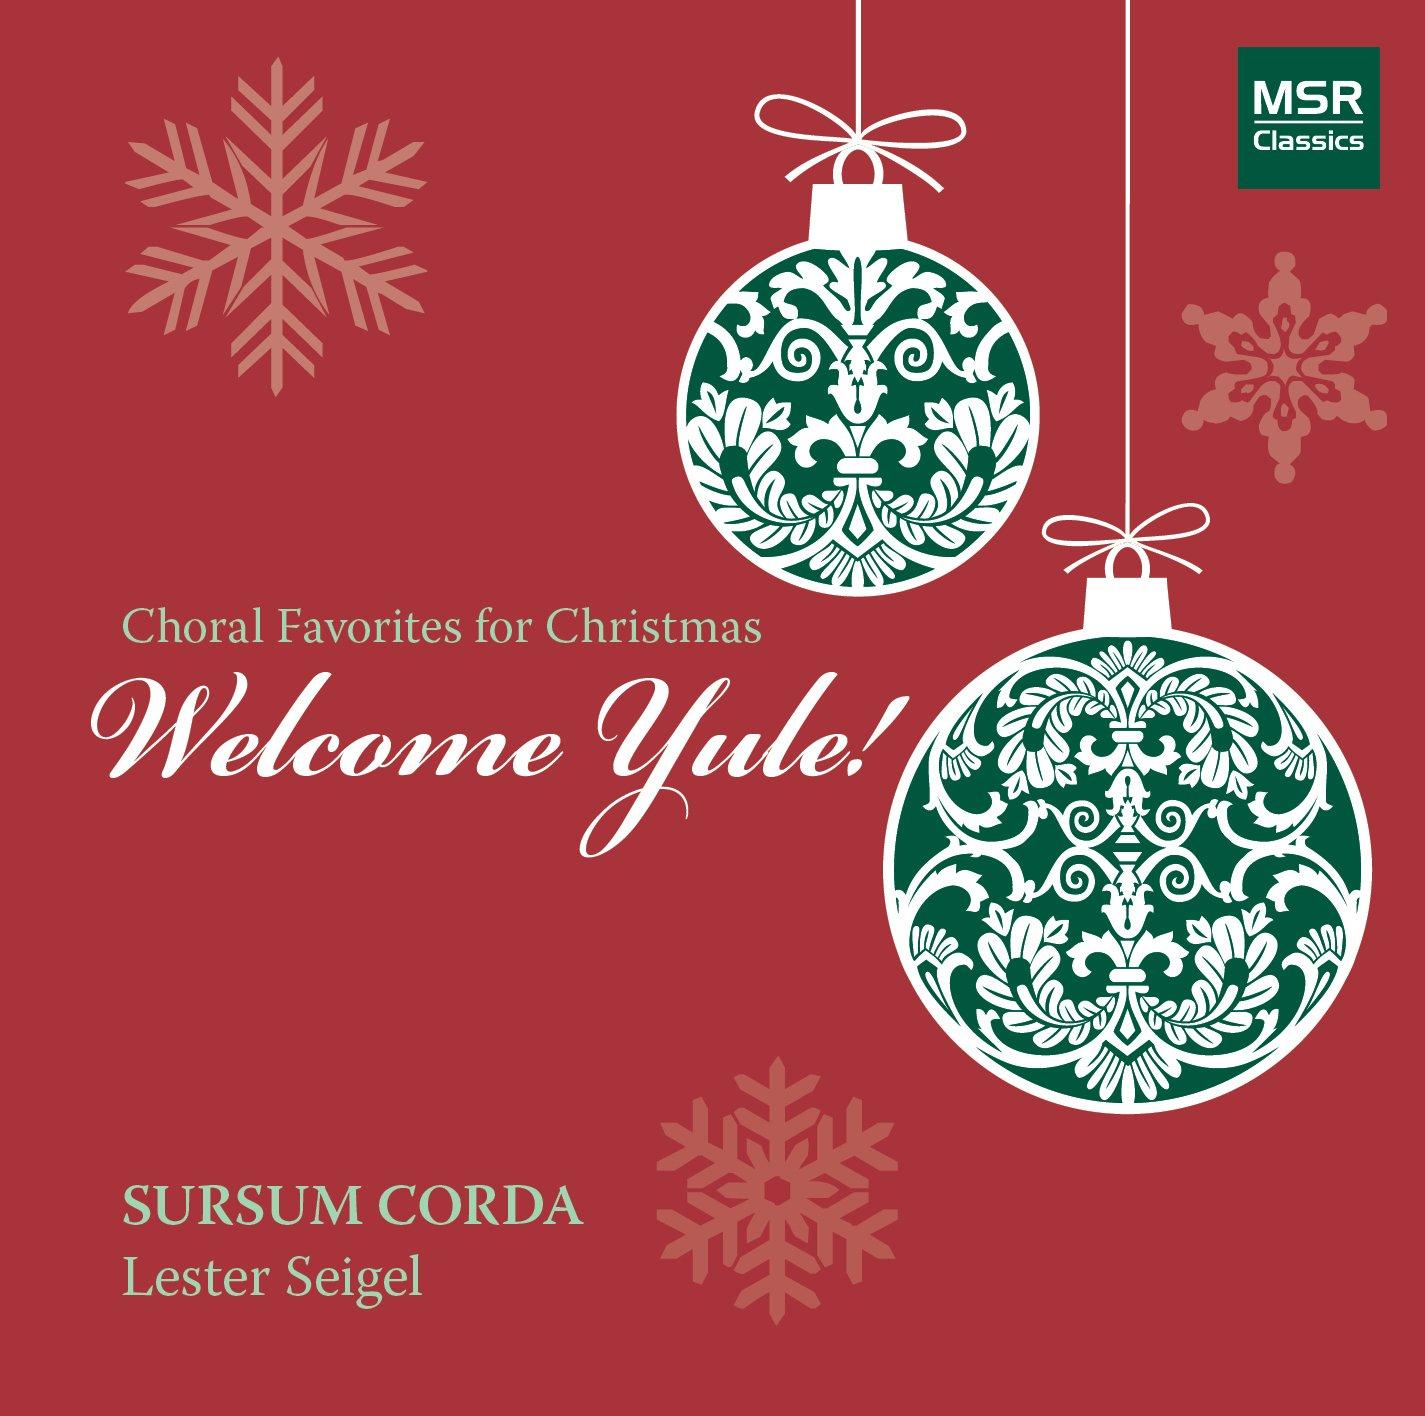 CD : SURSUM CORDA - Welcome Yule (CD)